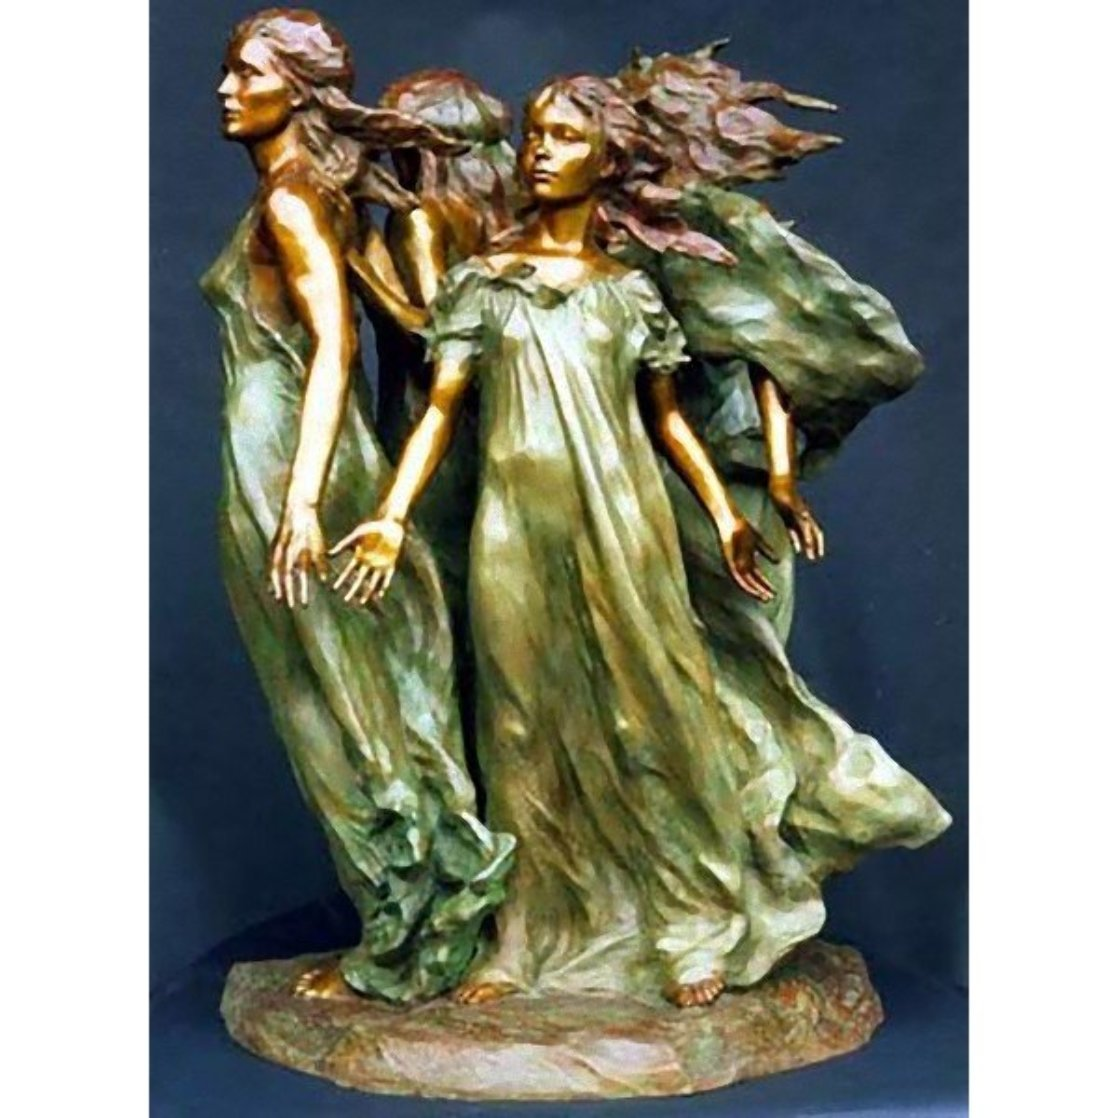 Daughters of Odessa Bronze Sculpture 24 in Sculpture by Frederick Hart